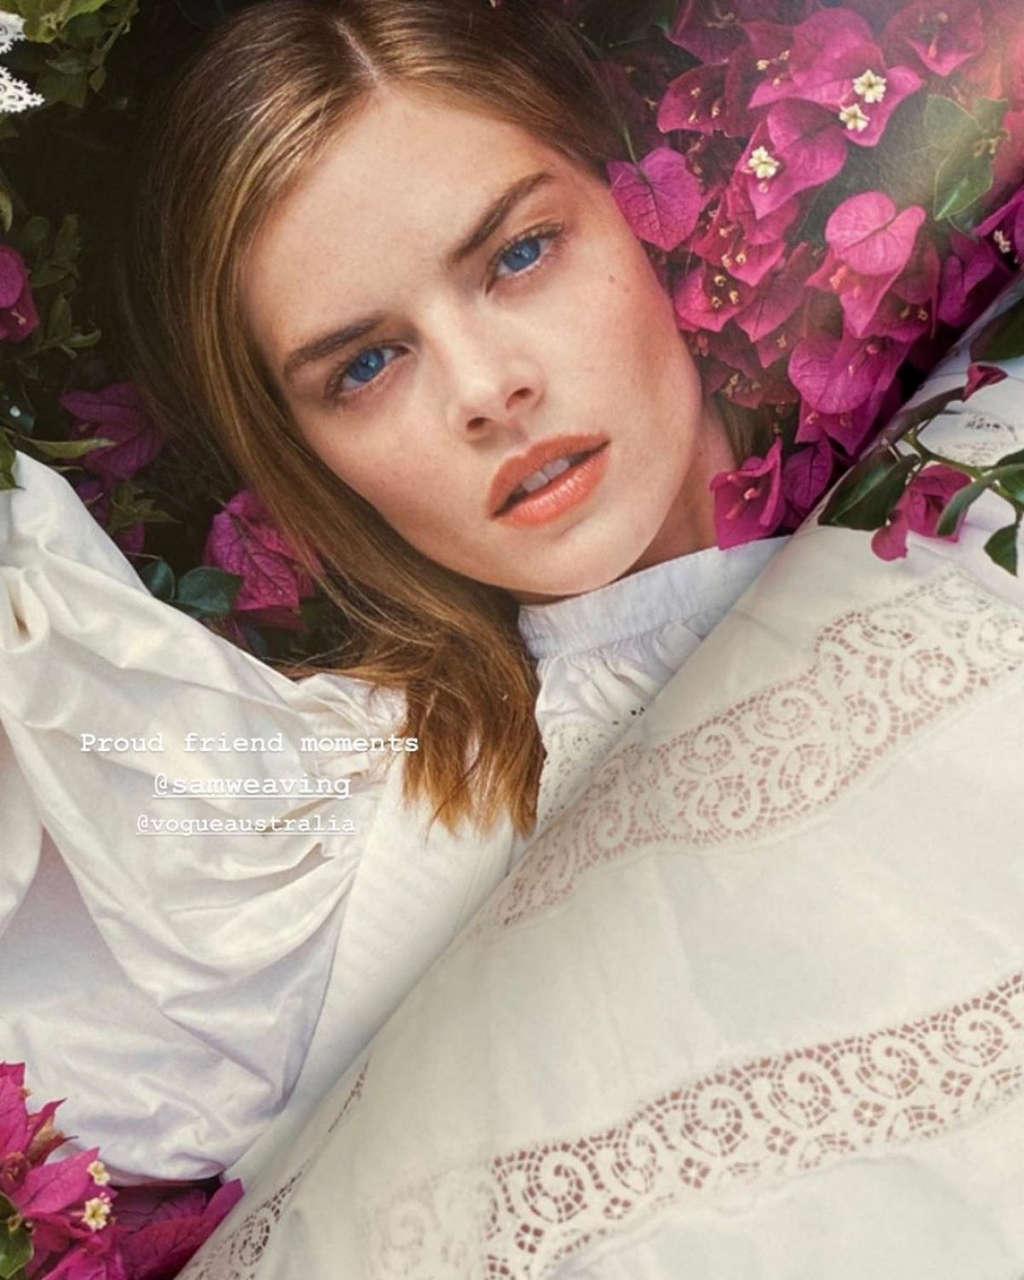 Samara Weaving For Vogue Magazine Australia September